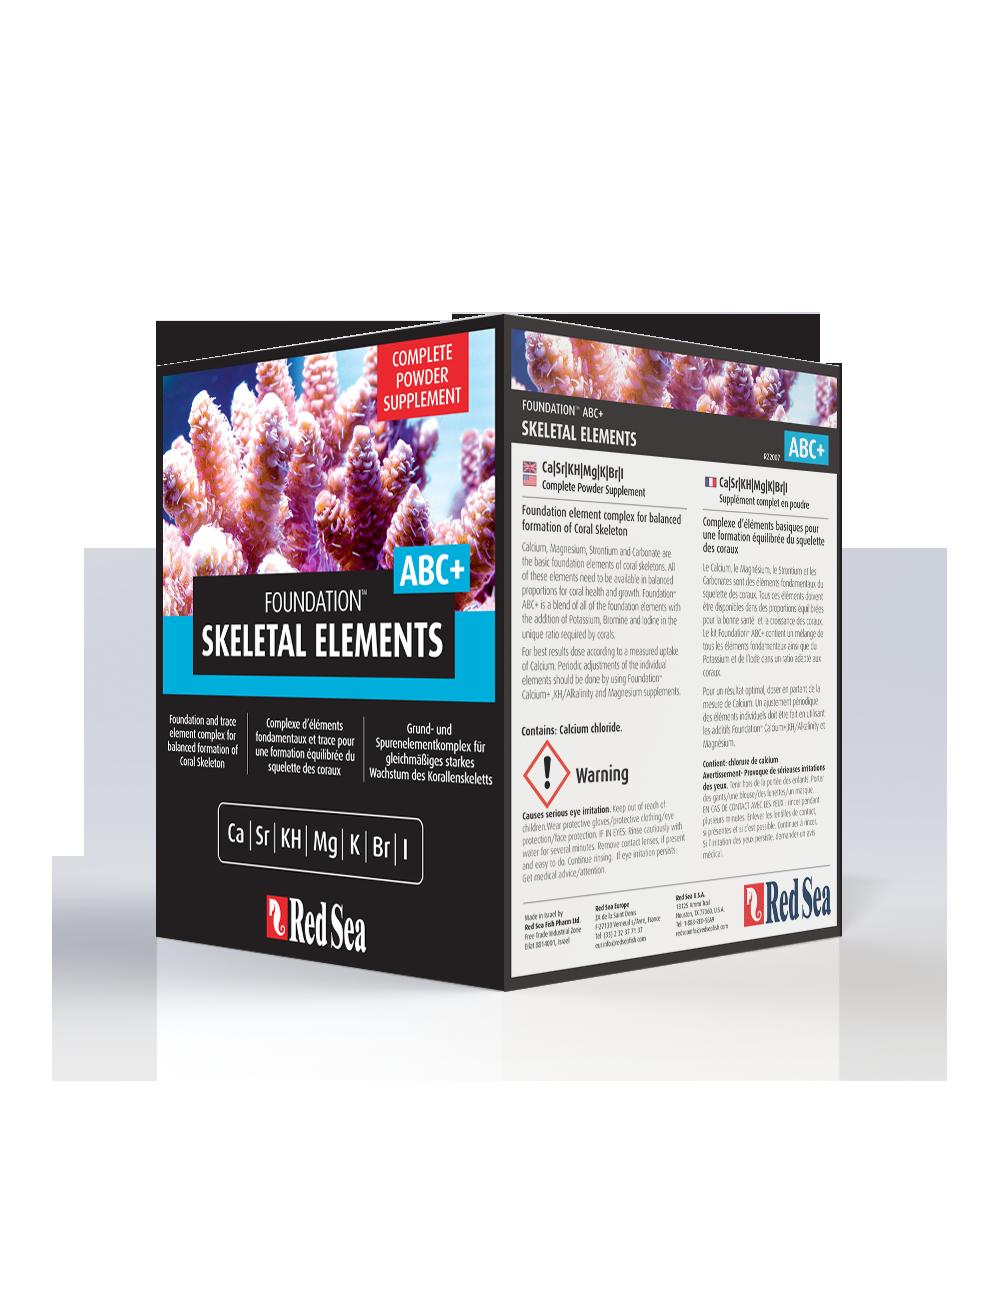 Red Sea - Skeletal Elements - Reef Foundation ABC Plus Powder 1KG box